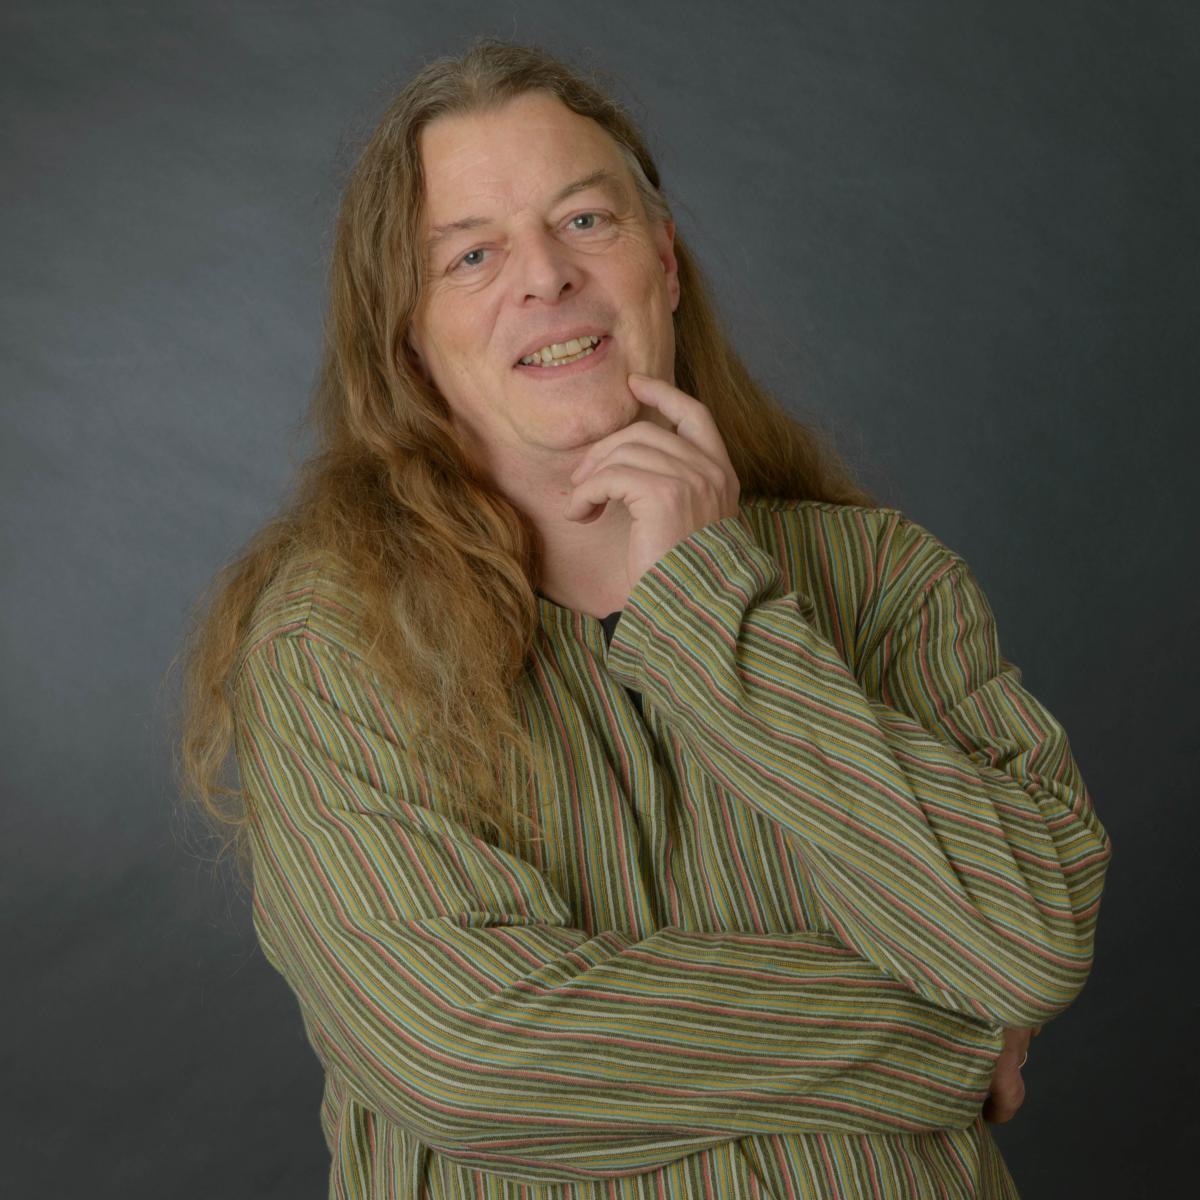 Stefan Schmidt-Bilkenroth in den Stadtrat